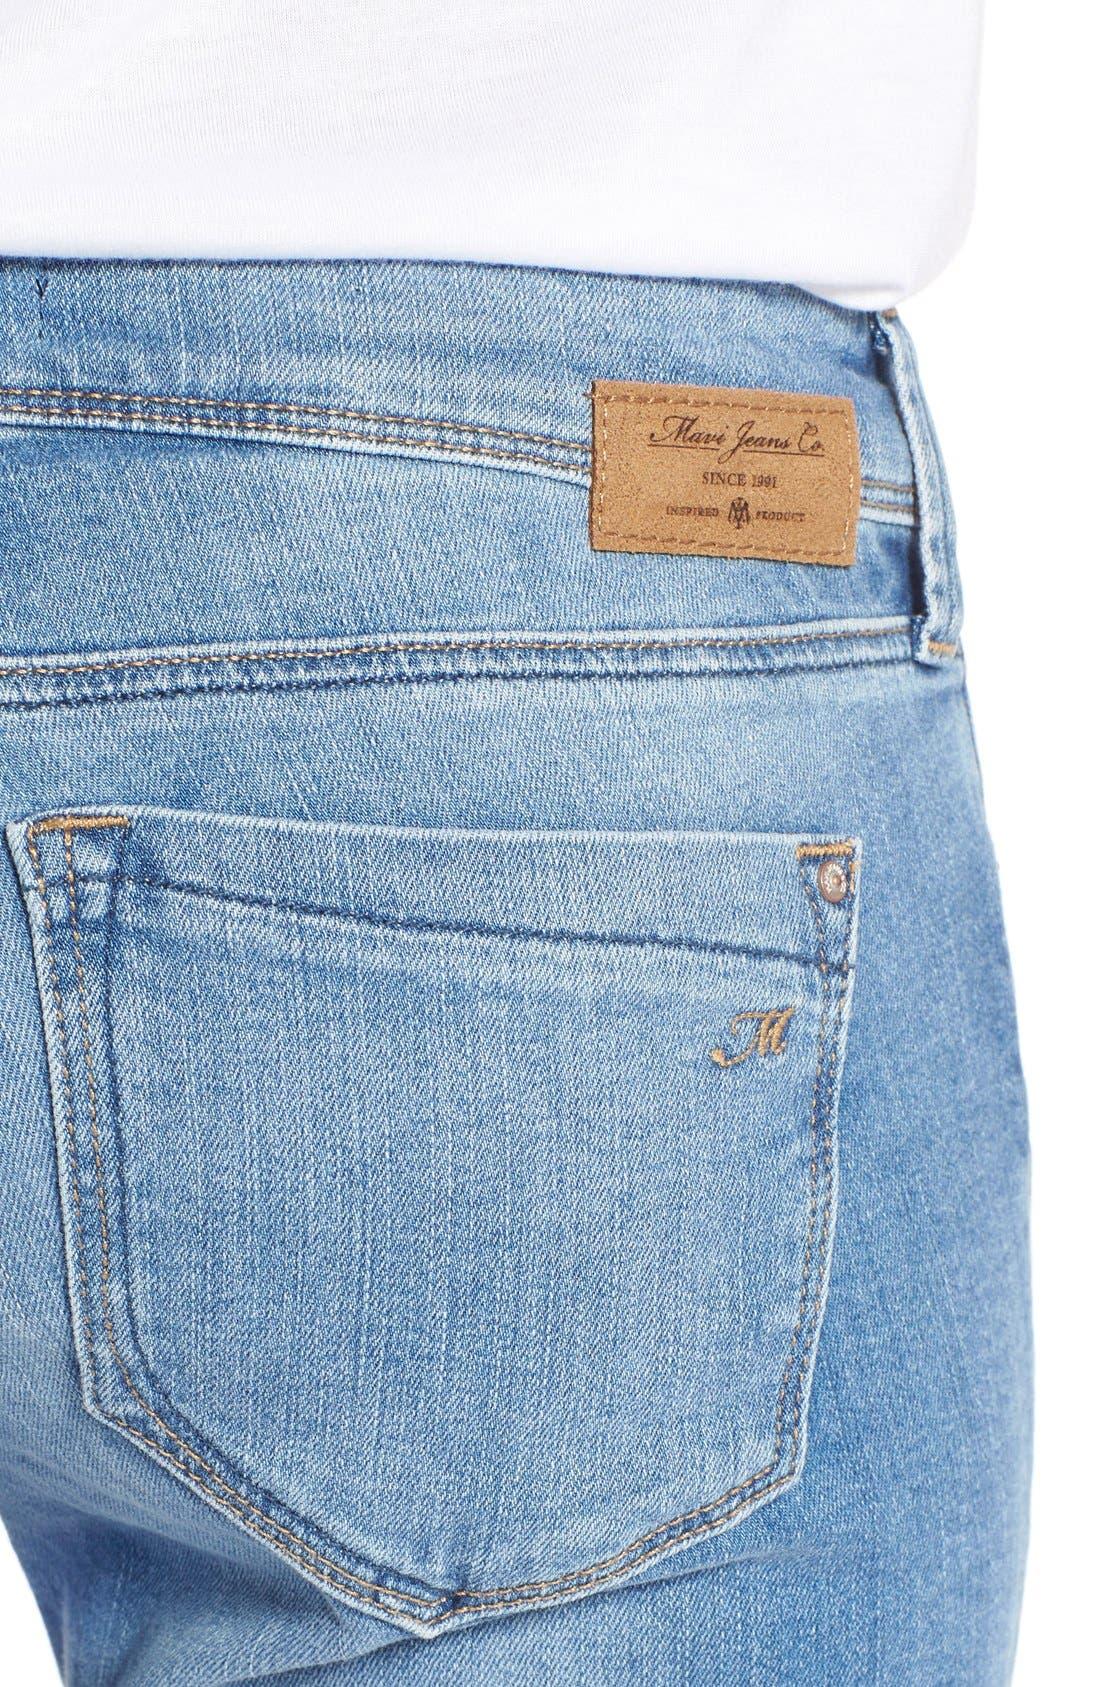 Alternate Image 4  - Mavi Jeans 'Peace' Stretch Flare Leg Jeans (Light Ripped)